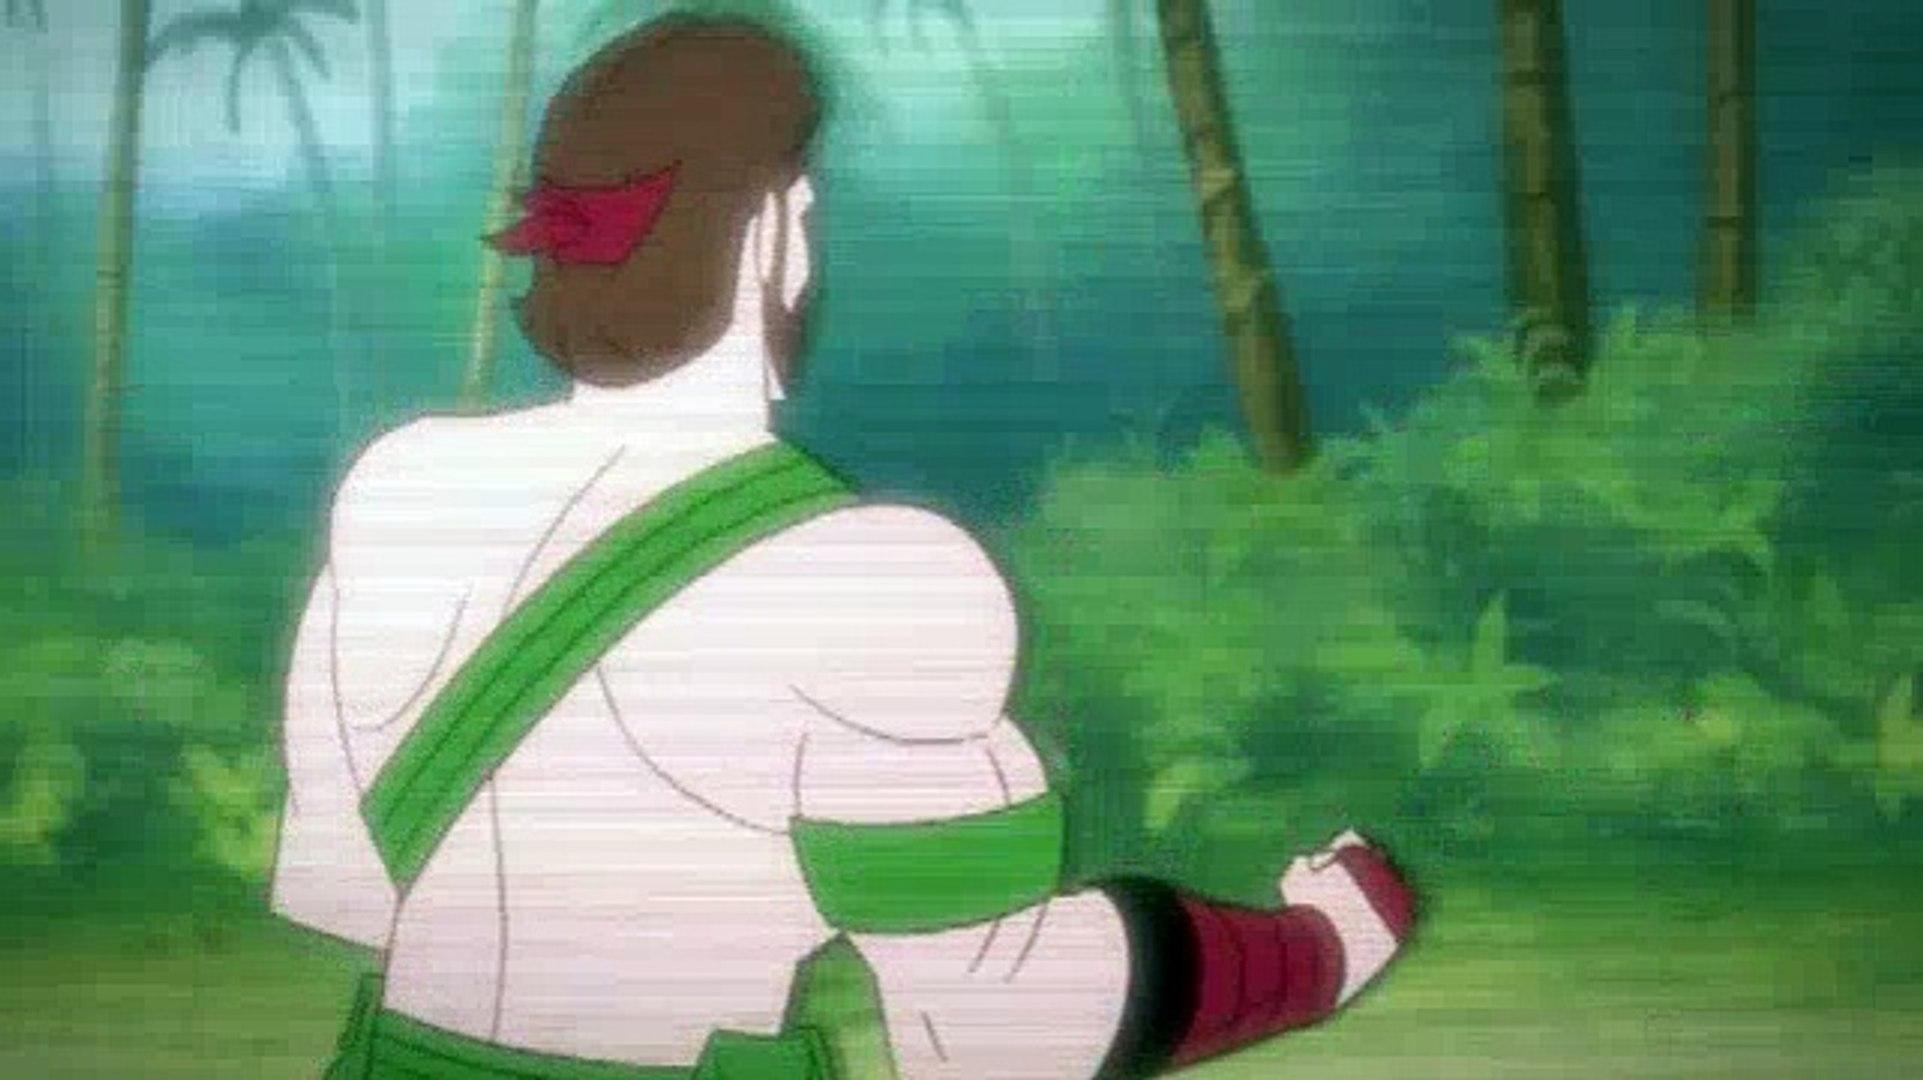 Teenage Mutant Ninja Turtles S04e20 The Super Shredder Video Dailymotion